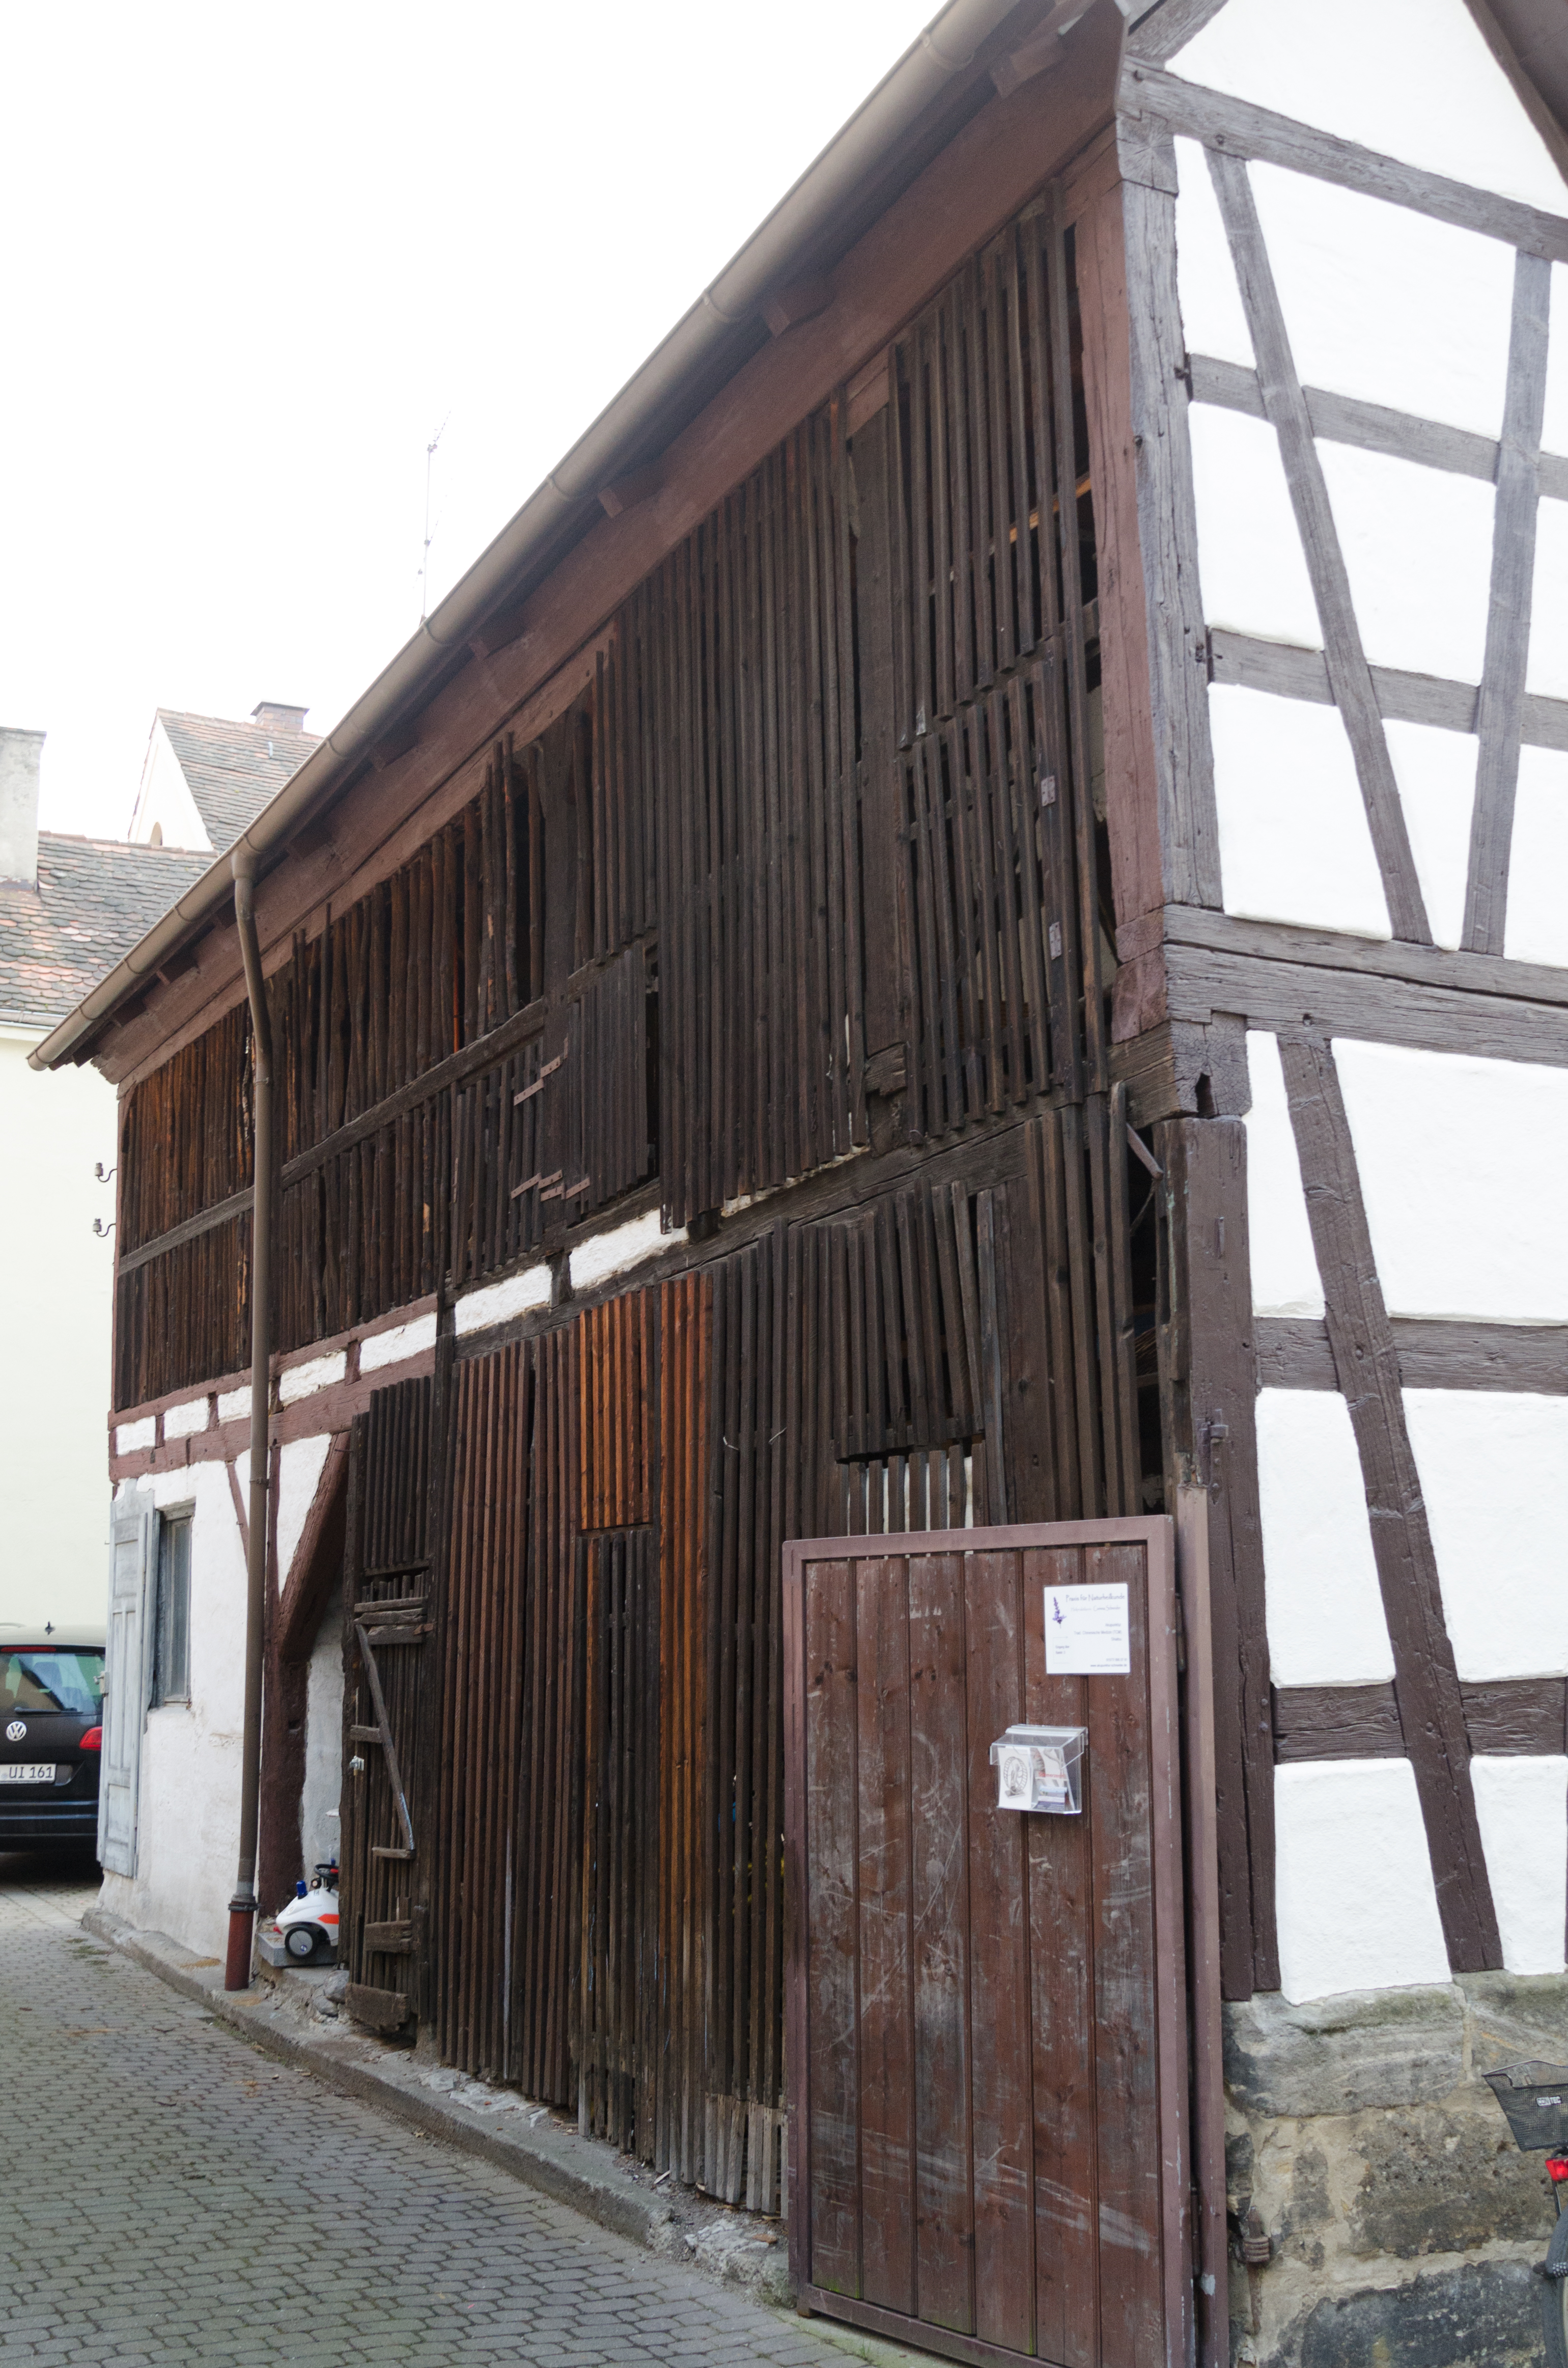 file:forchheim, badstraße 5, holzlege, 003 - wikimedia commons